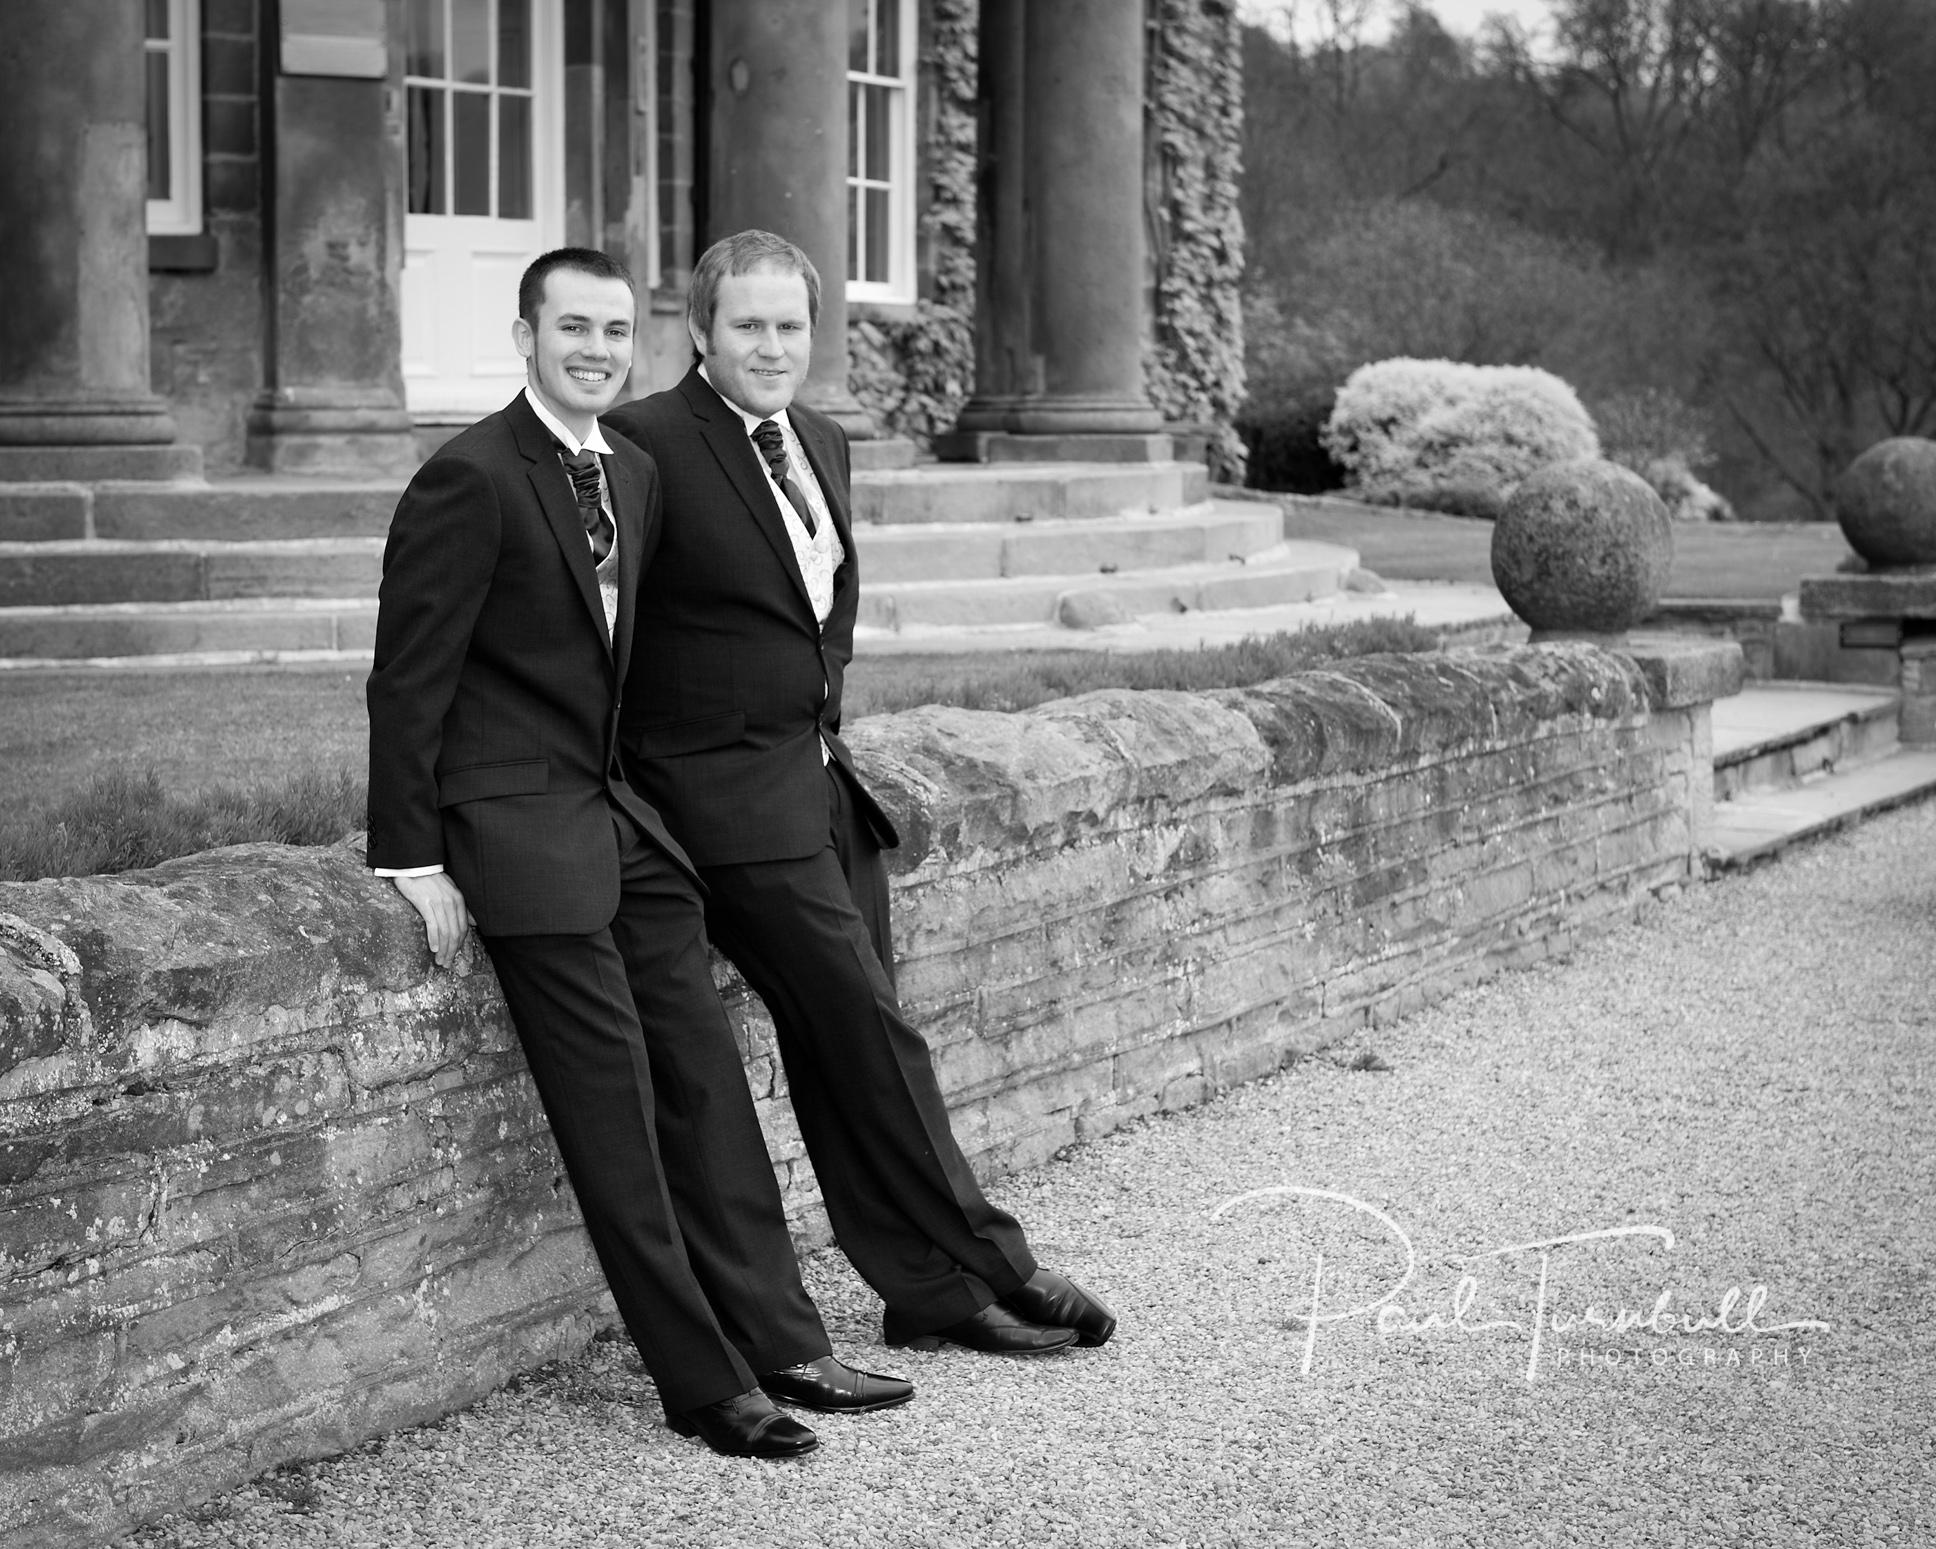 wedding-photography-wood-hall-wetherby-yorkshire-010.jpg